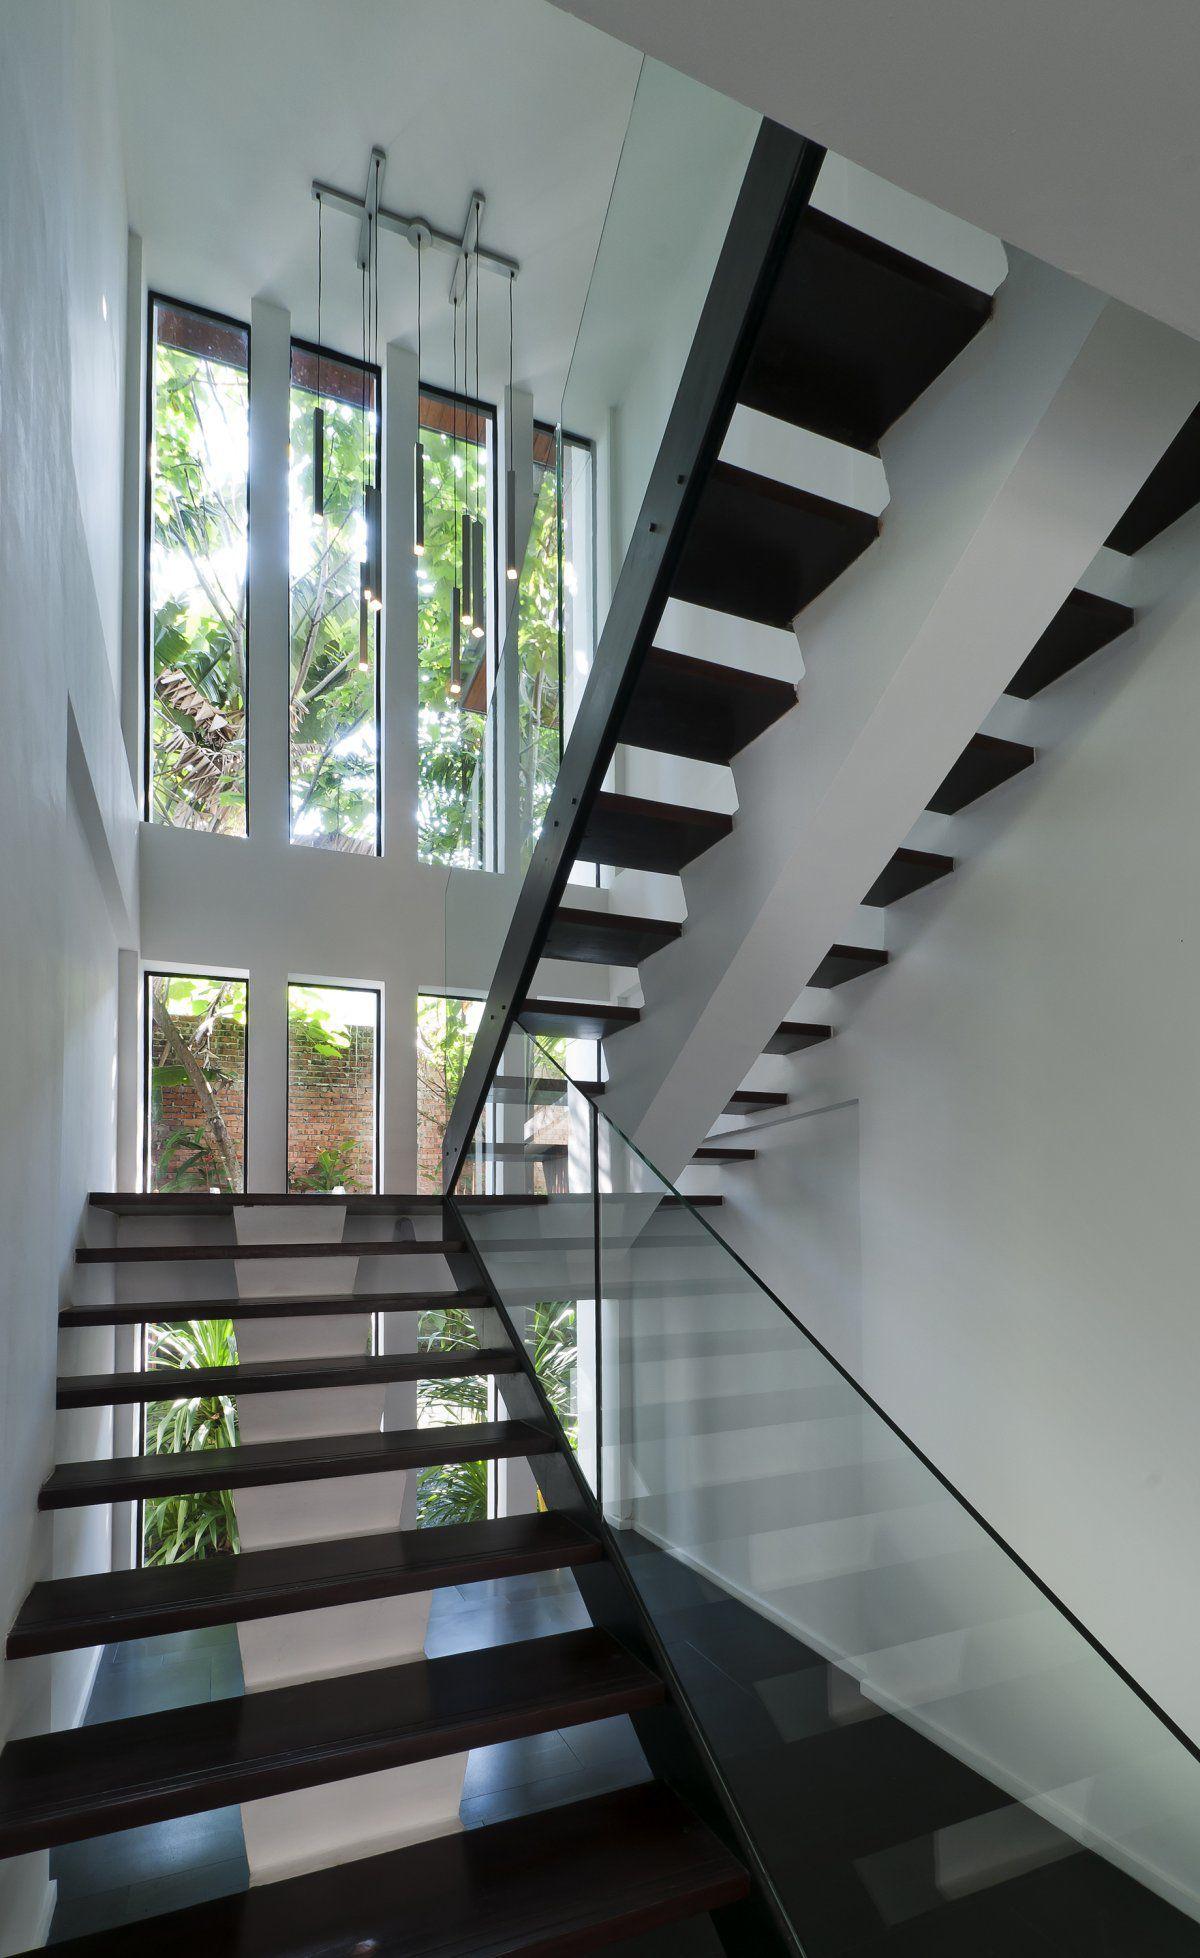 Hijauan-House-18